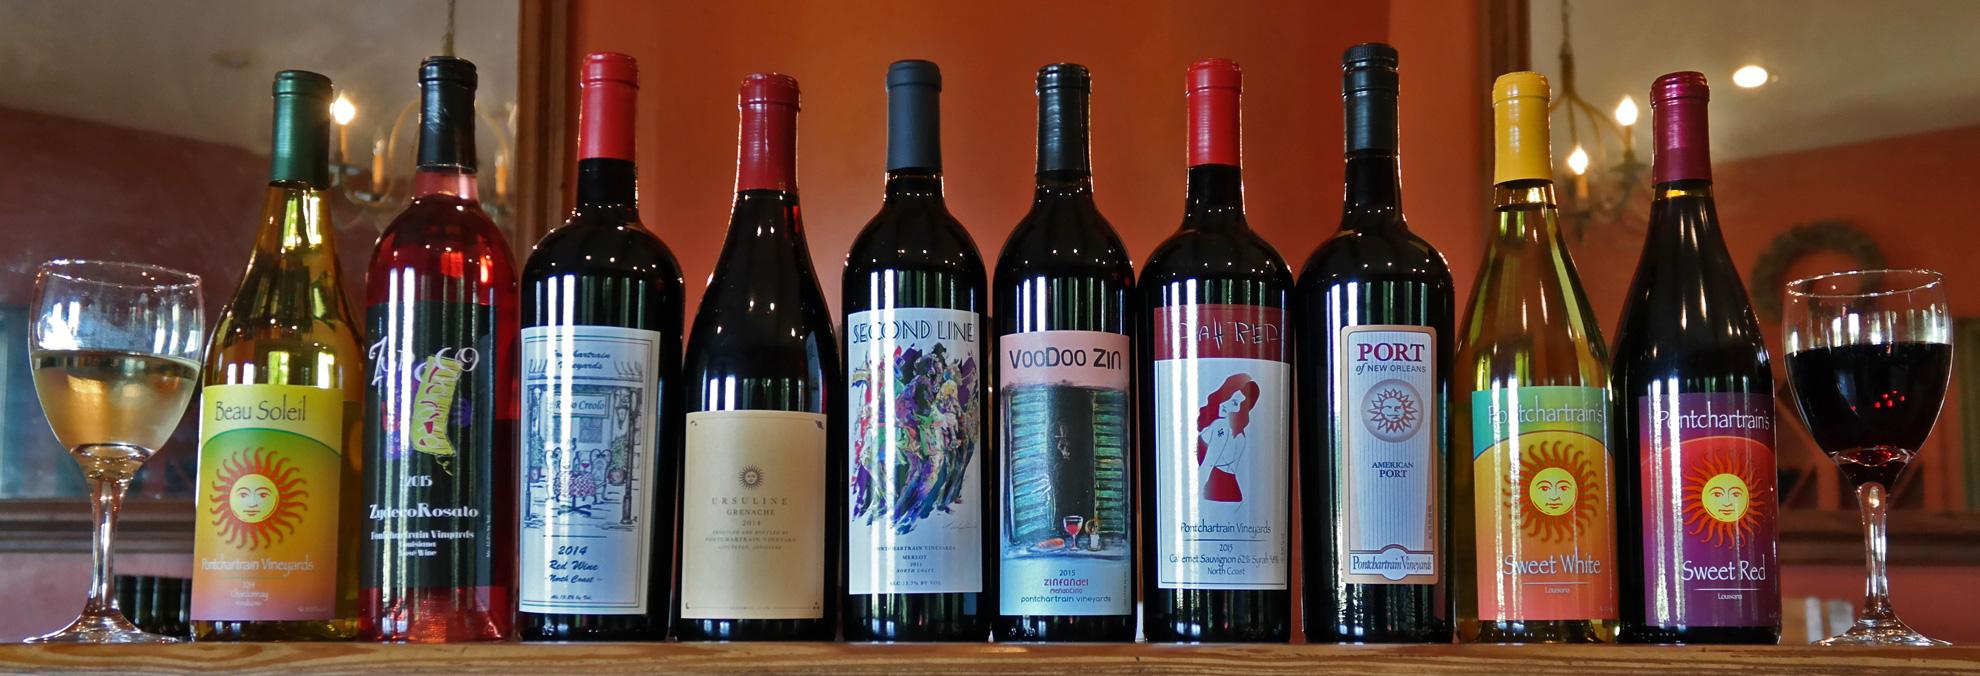 Pontchartrain Vineyards